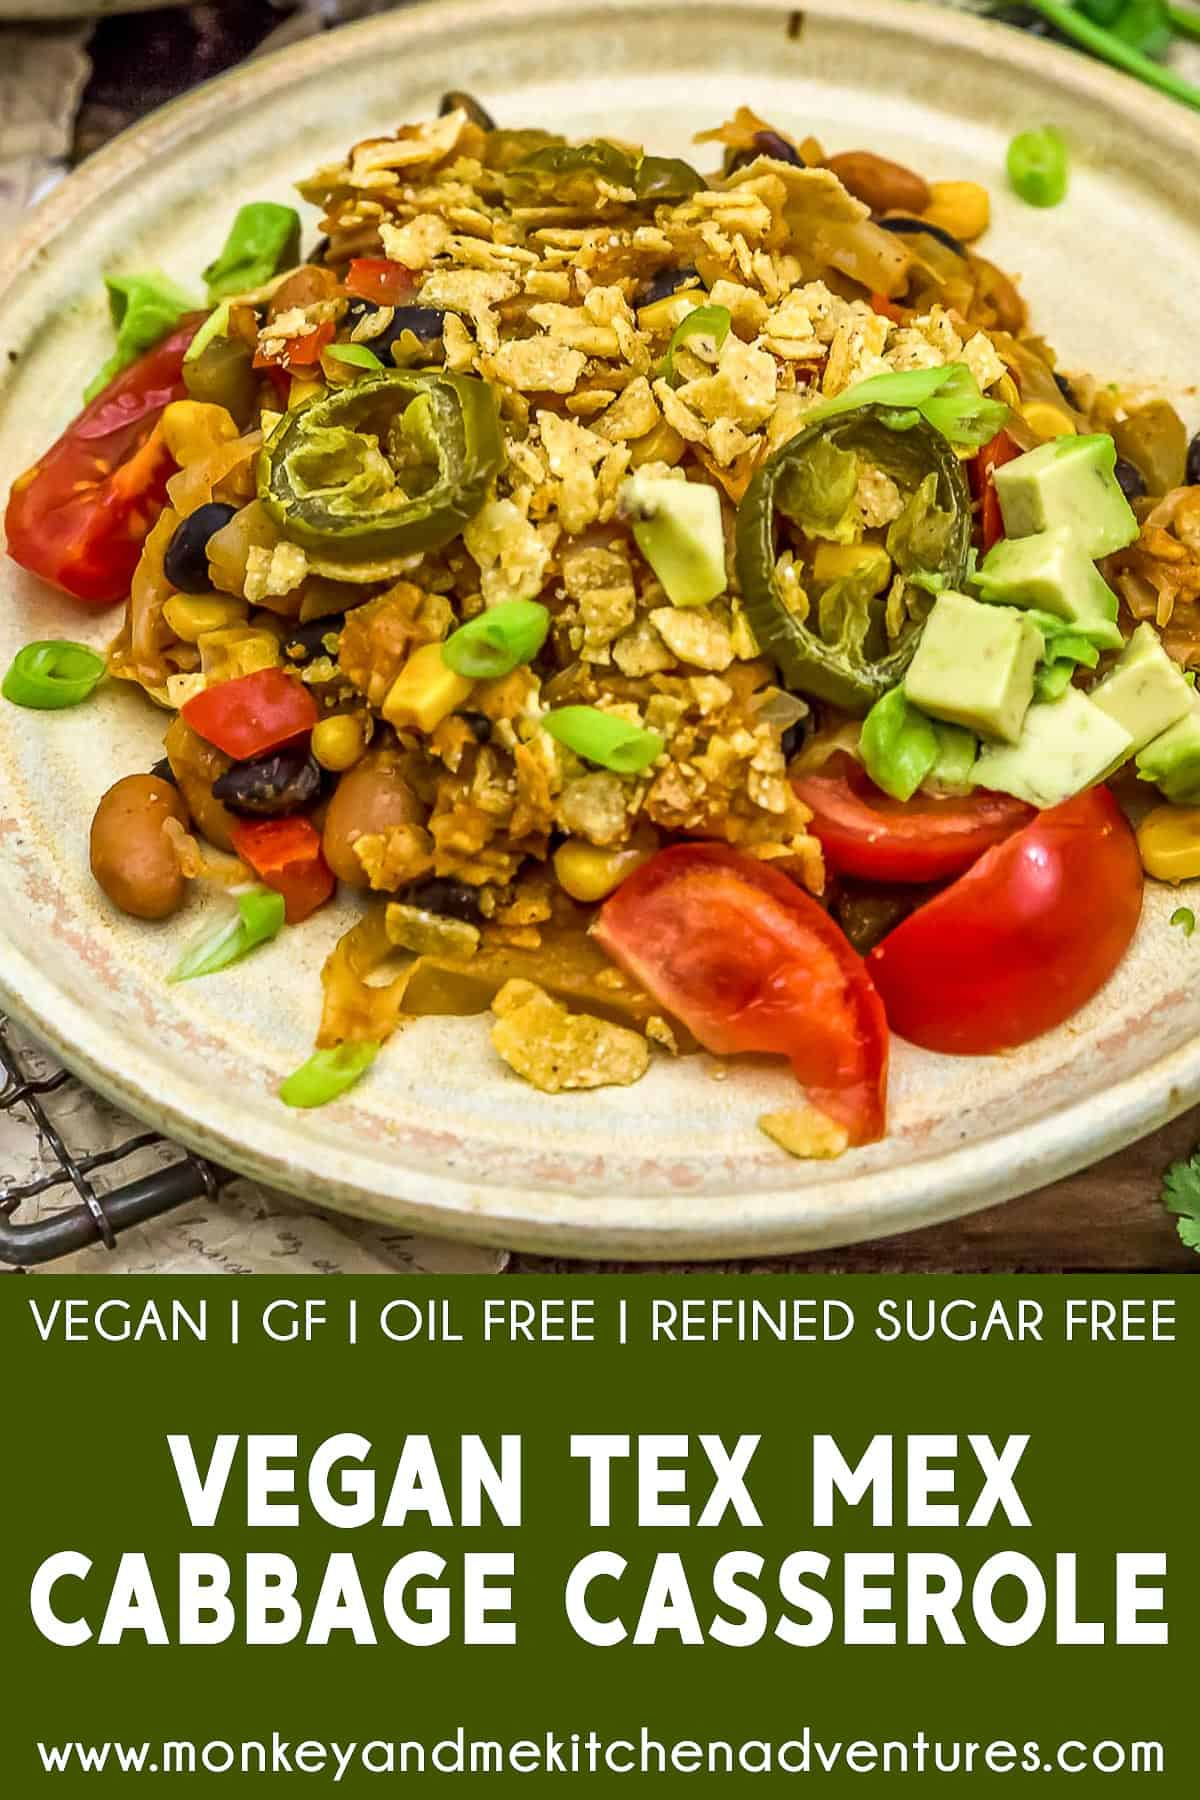 Vegan Tex-Mex Cabbage Casserole with text description